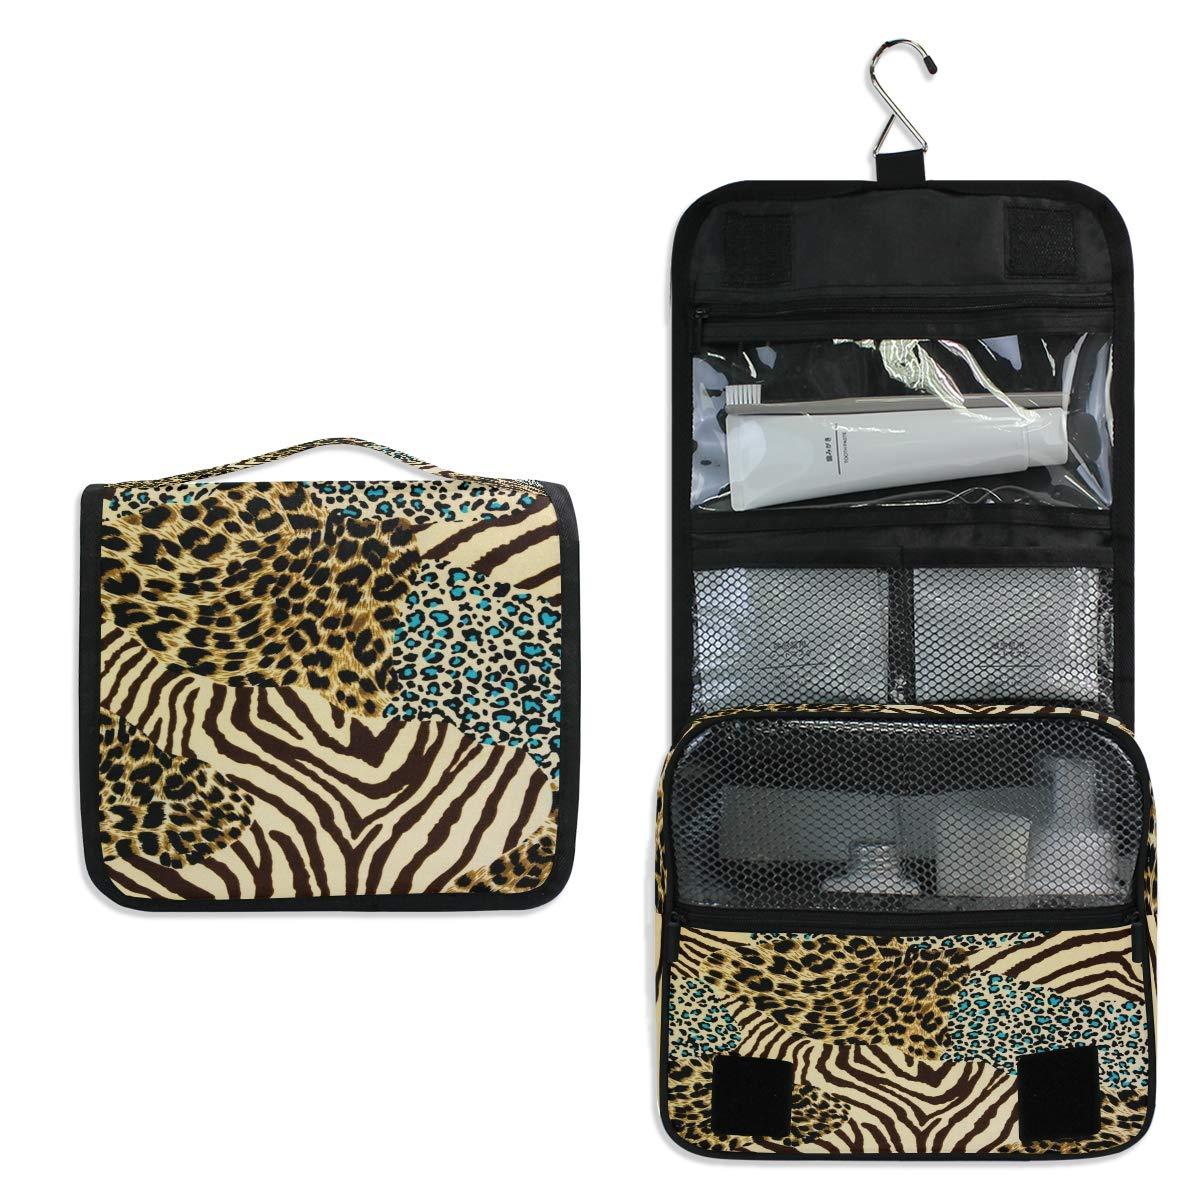 CCDMJ Hanging Toiletry Bag Animal Leopard Print Zebra Cosmetics Makeup Bags with Hook Portable Multifunction Travel bag Wash Bathroom Organizer for Women Girls